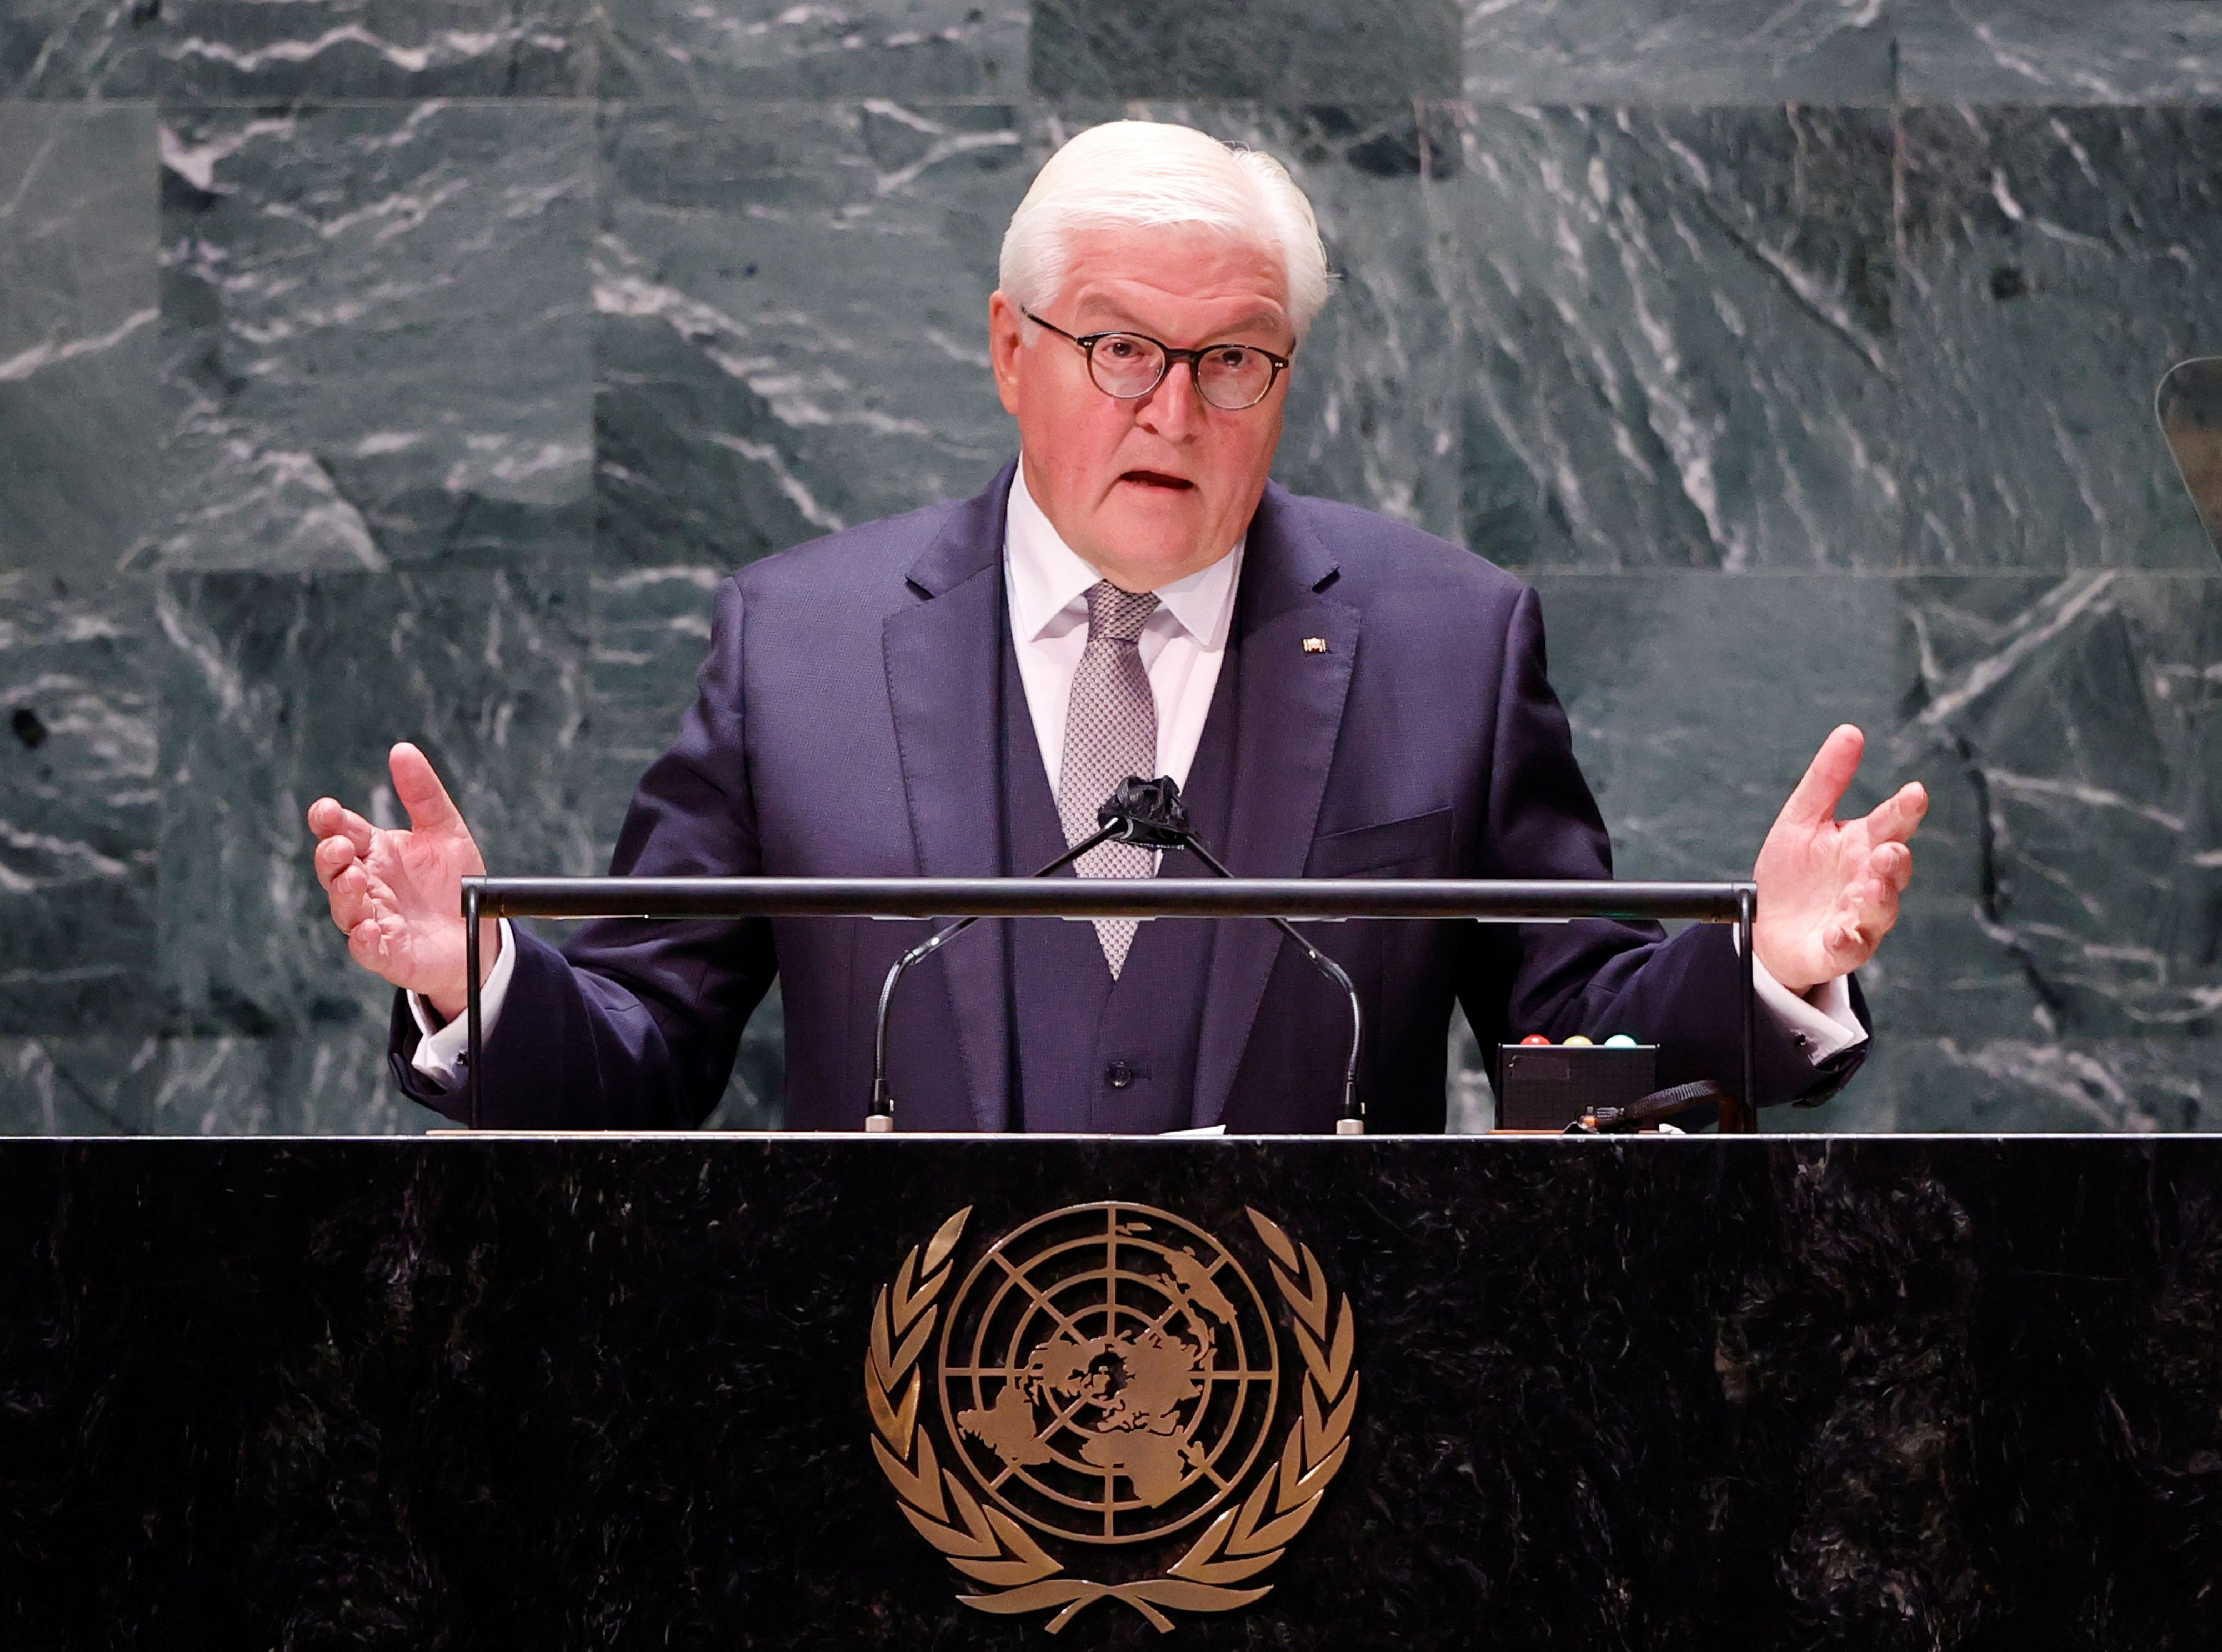 El presidente alemán, Frank-Walter Steinmeier ante la Asamblea de la ONU, en Nueva York (John Angelillo/Pool via REUTERS)